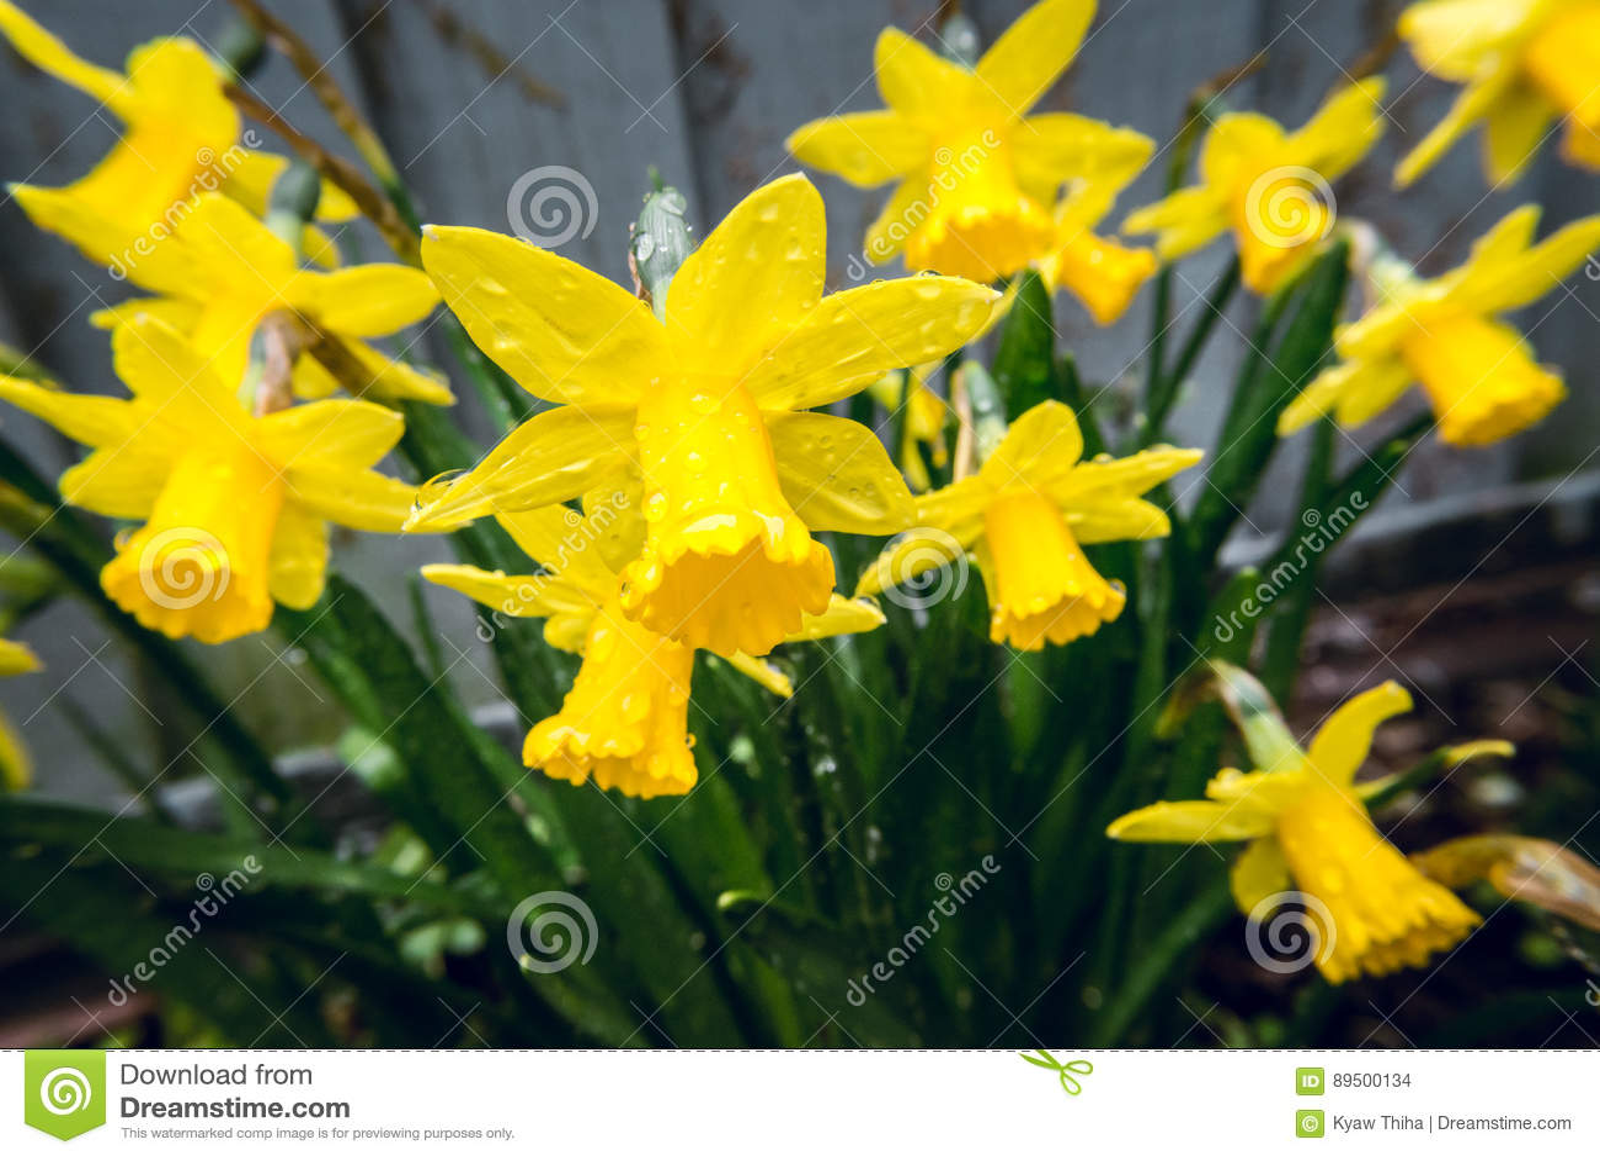 Daffodils Under The Rain In Early Spring In Backyard 4 Stock Photo